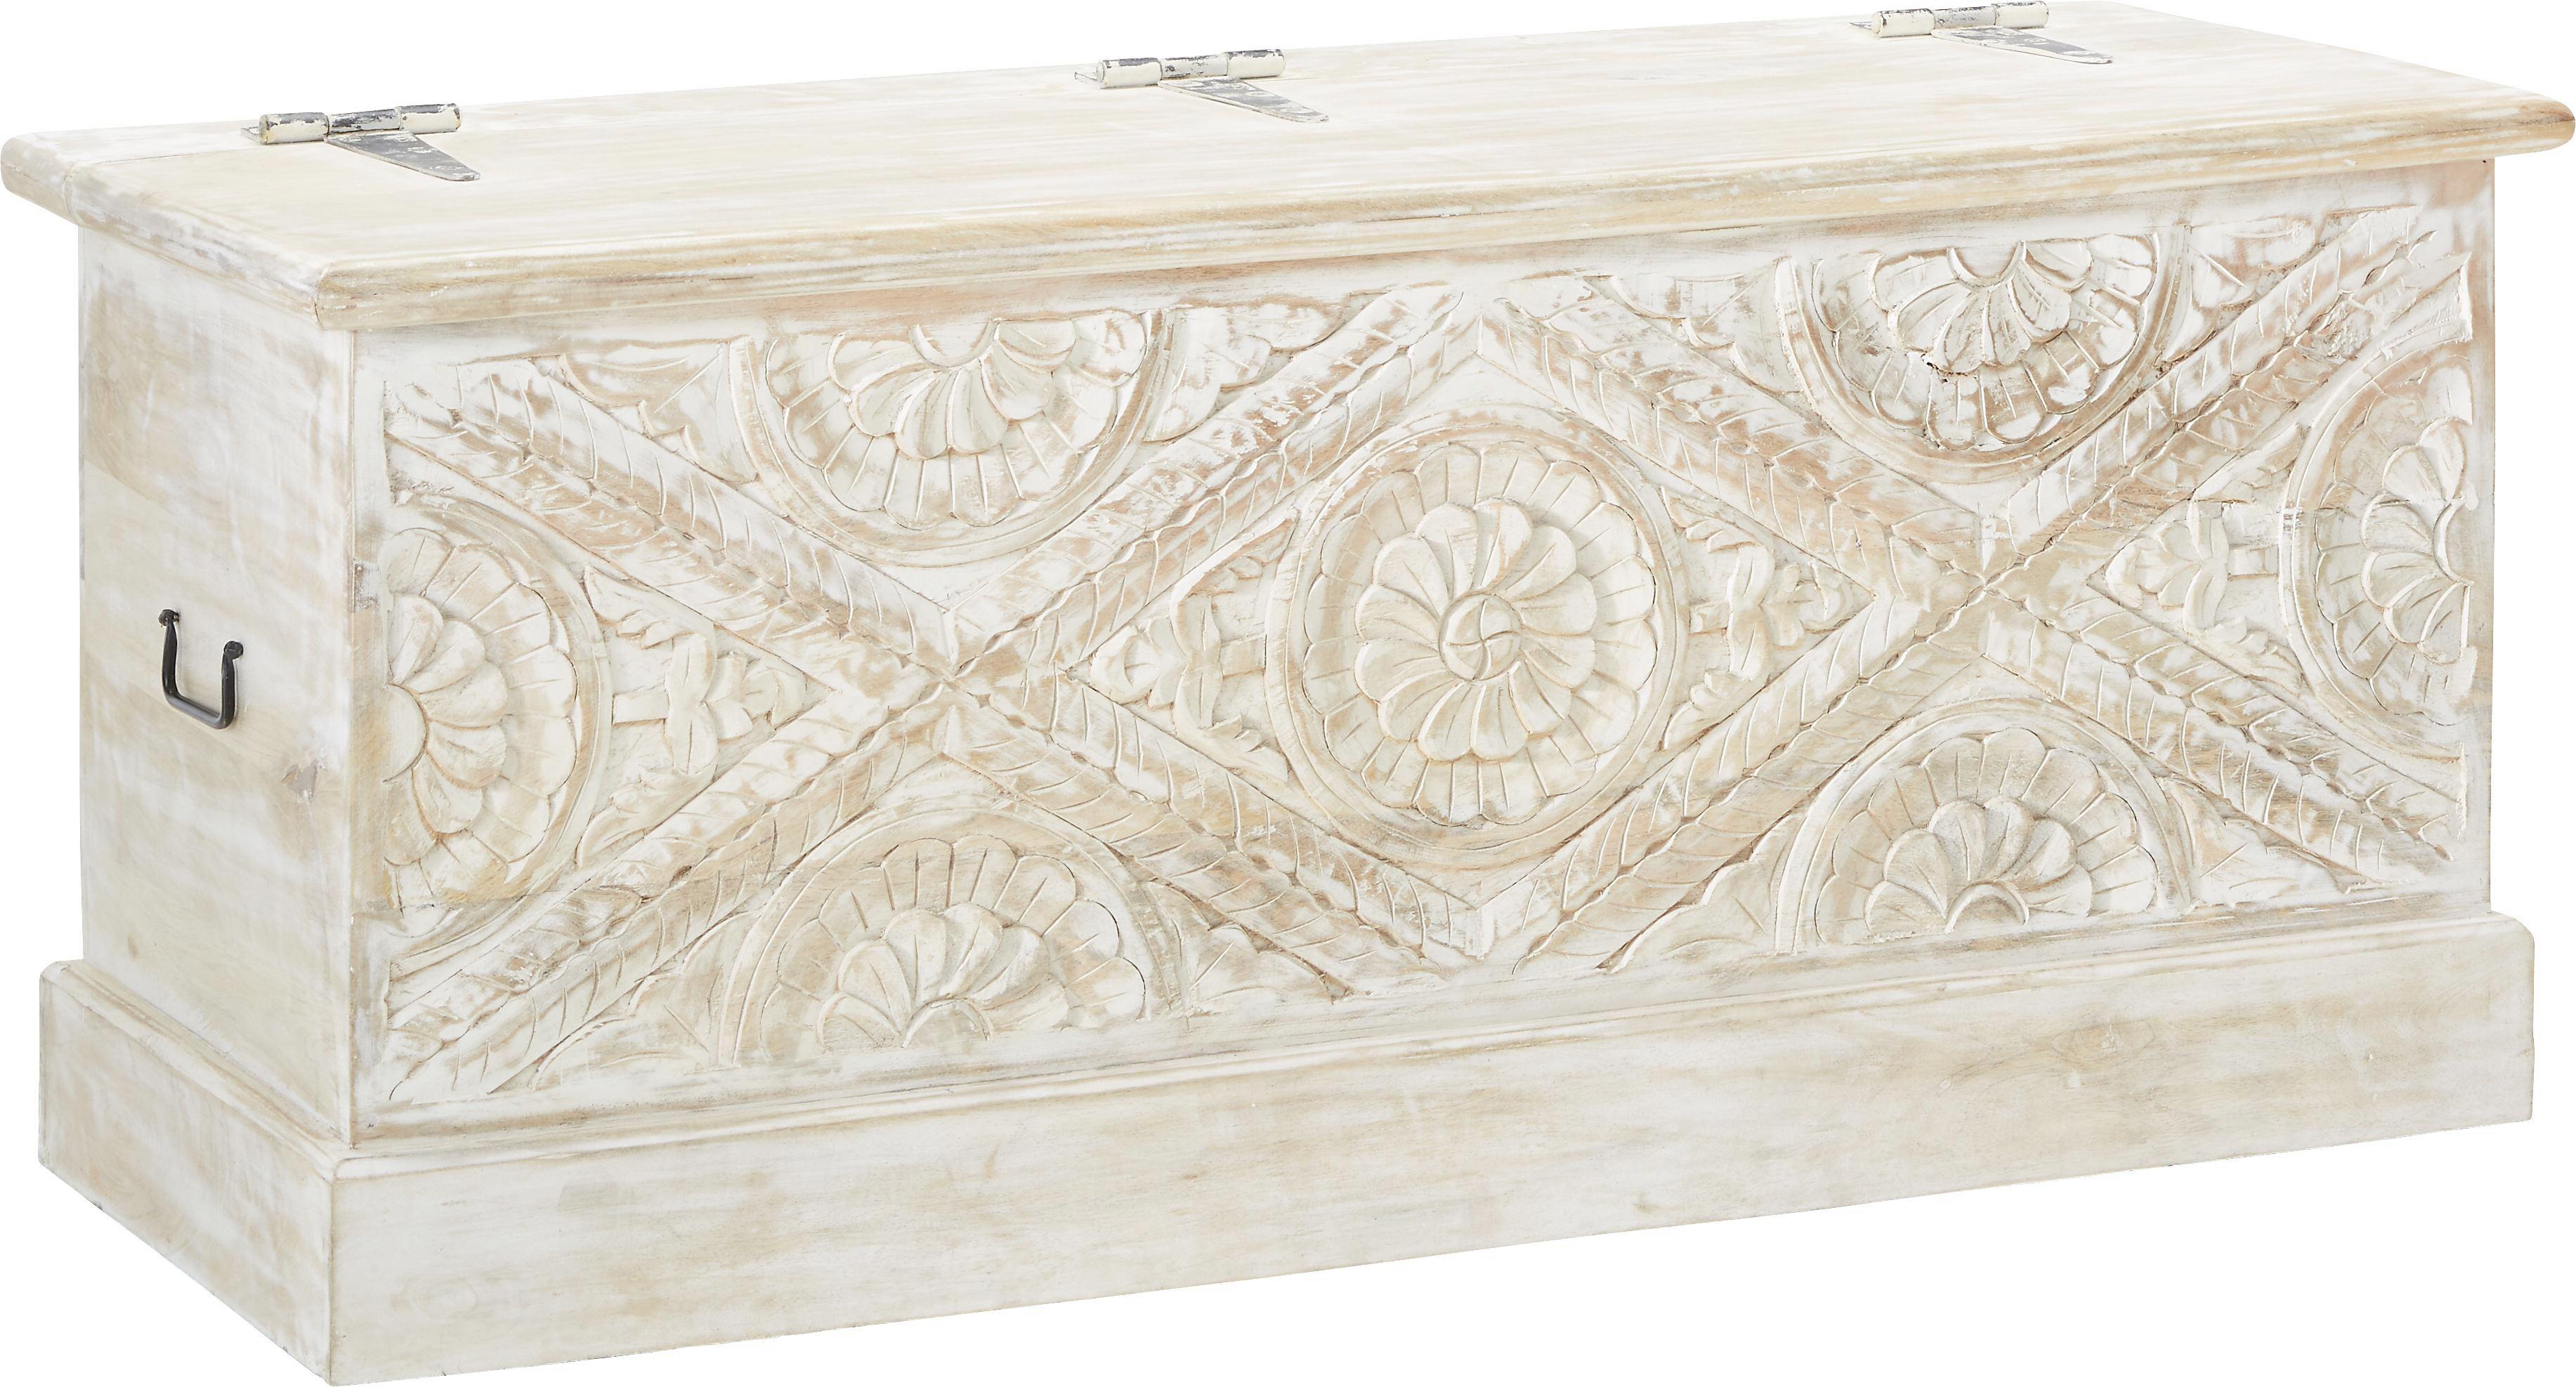 Truhe Weiß Holz - Naturfarben/Weiß, ROMANTIK / LANDHAUS, Holz (118/45/50cm) - MÖMAX modern living